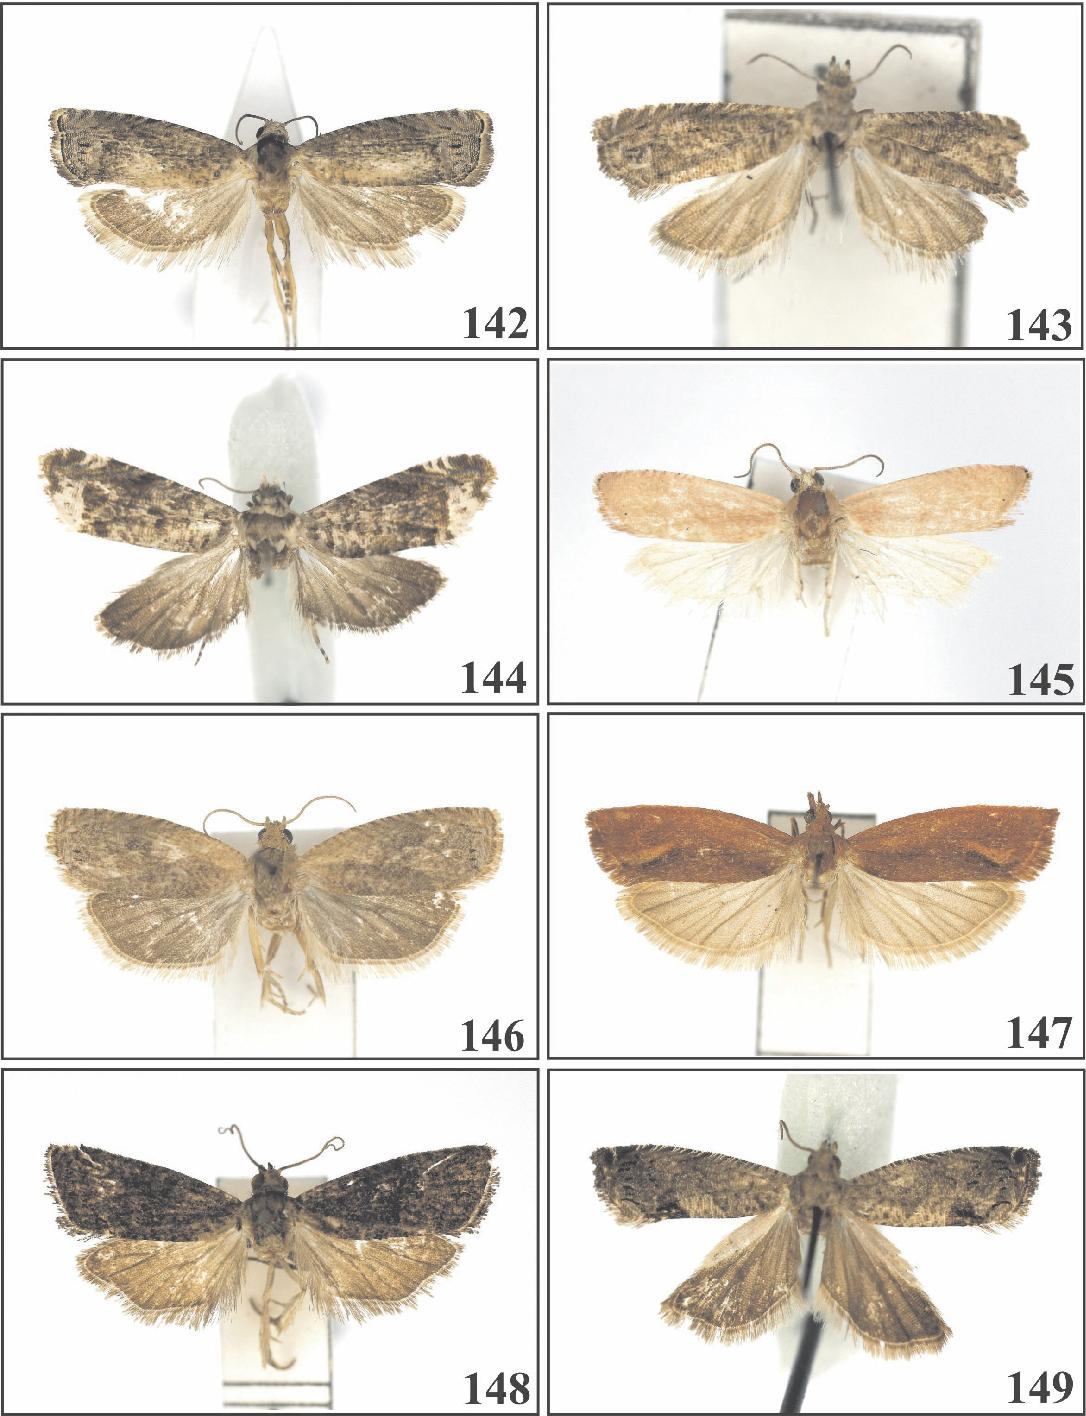 figure 142-149